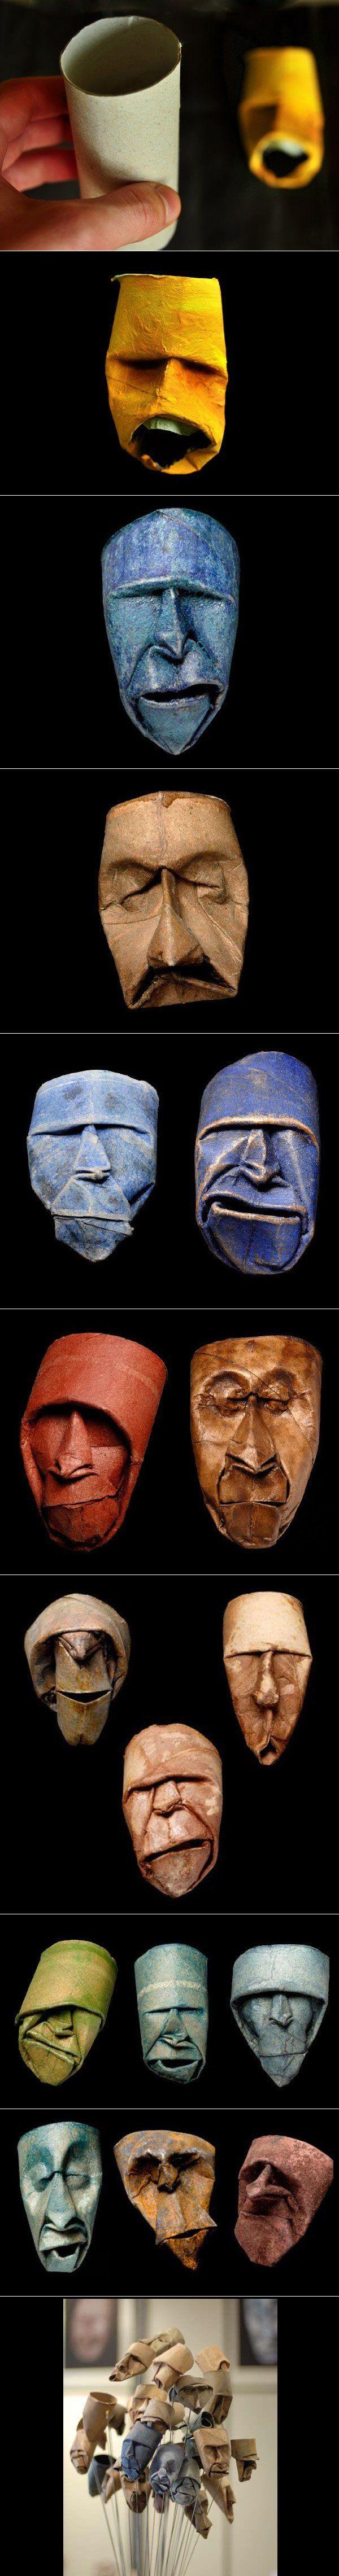 Geniale Masken aus Klopapierrollen - Win Bild | Webfail - Fail Bilder und Fail…